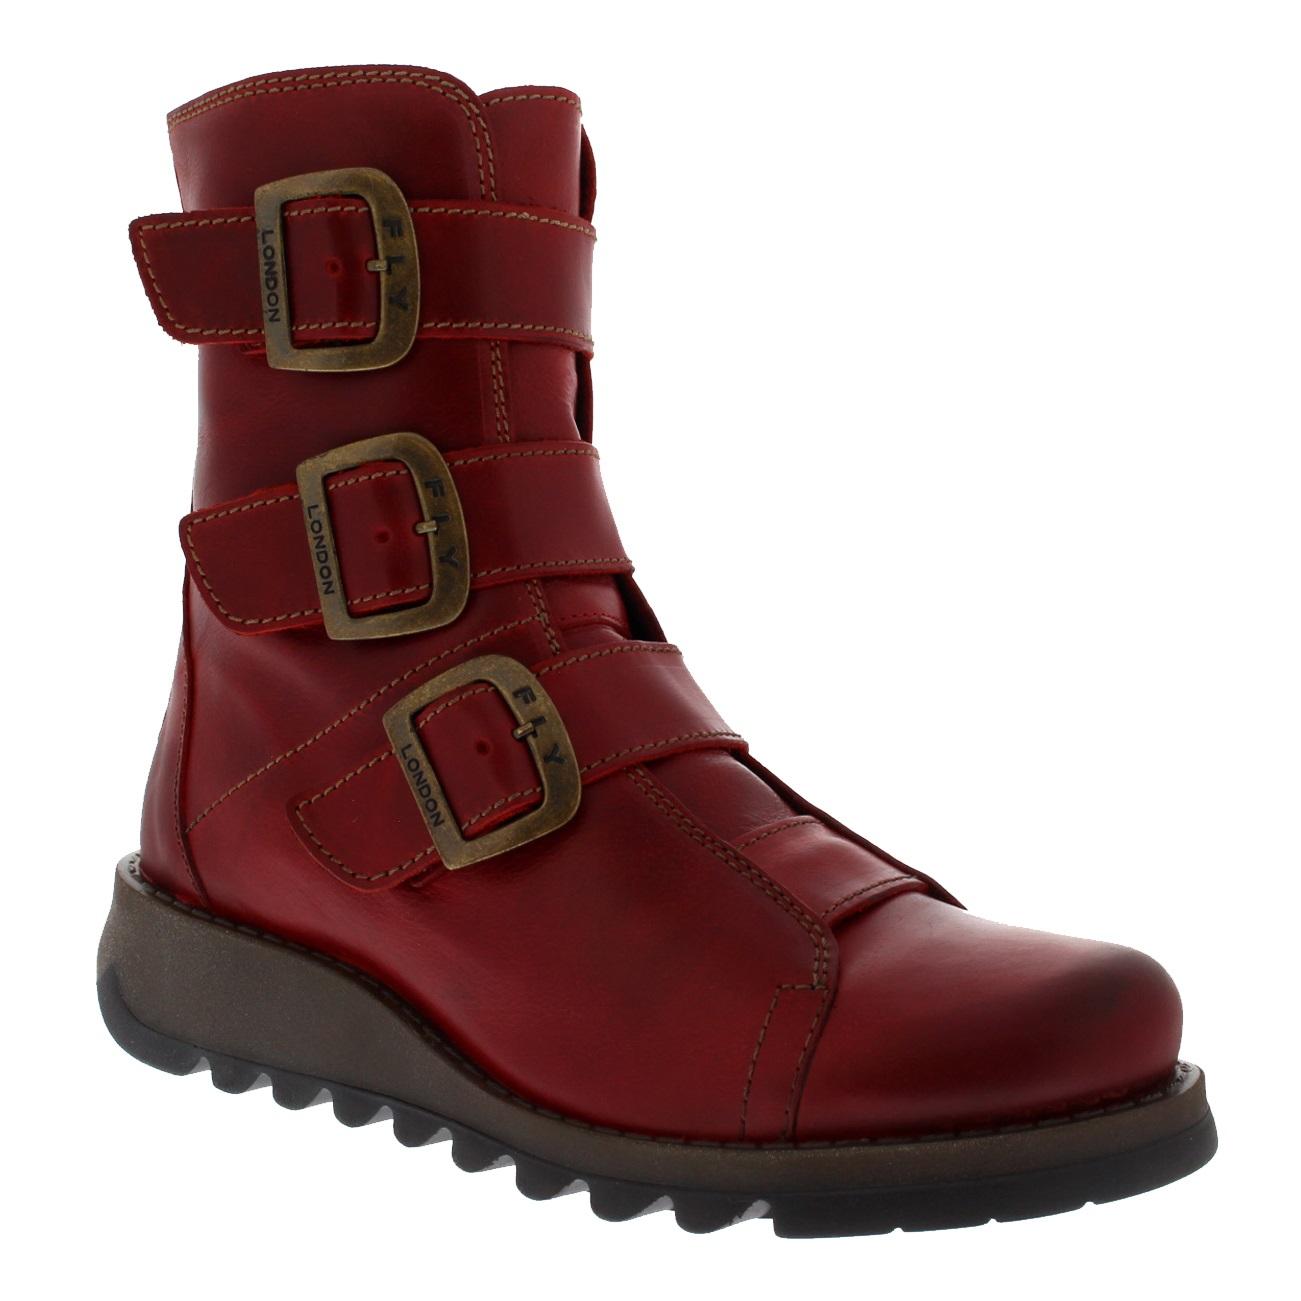 Womens-Fly-London-Scop-Rug-Leather-Biker-Winter-Wedge-Heel-Ankle-Boots-UK-3-9